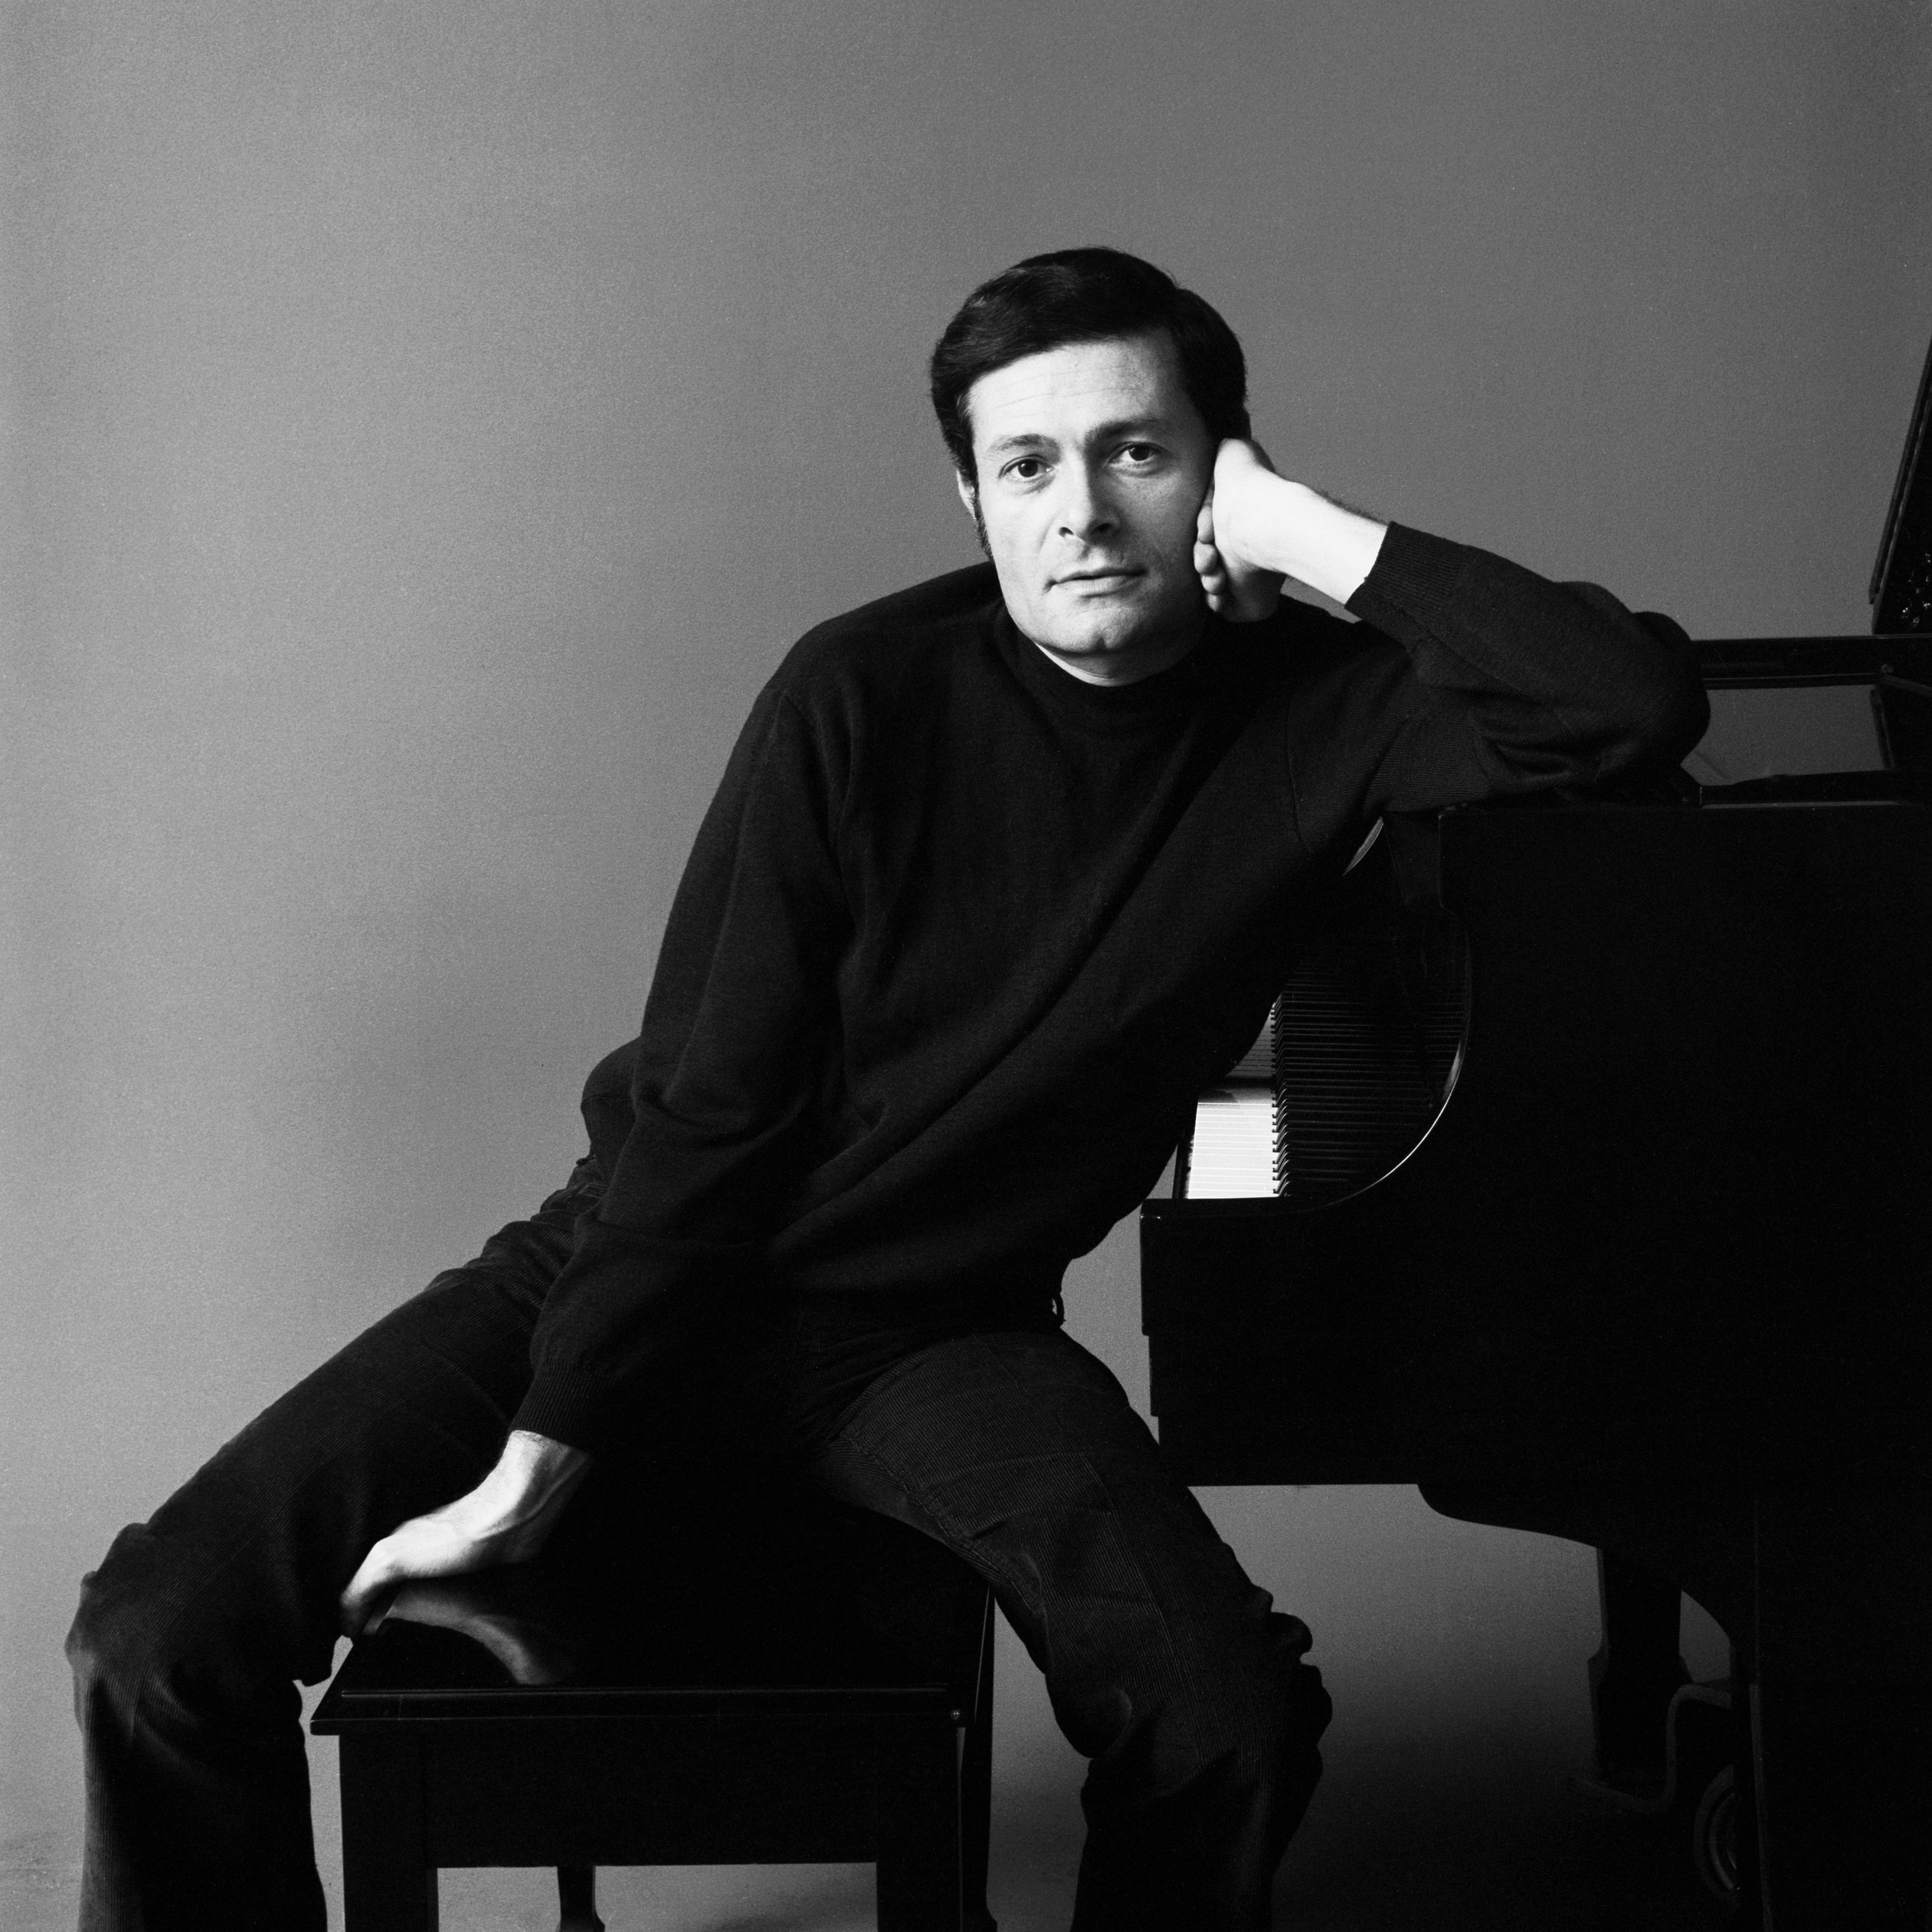 Portrait of composer Jerry Herman, c: 1960s-70s.